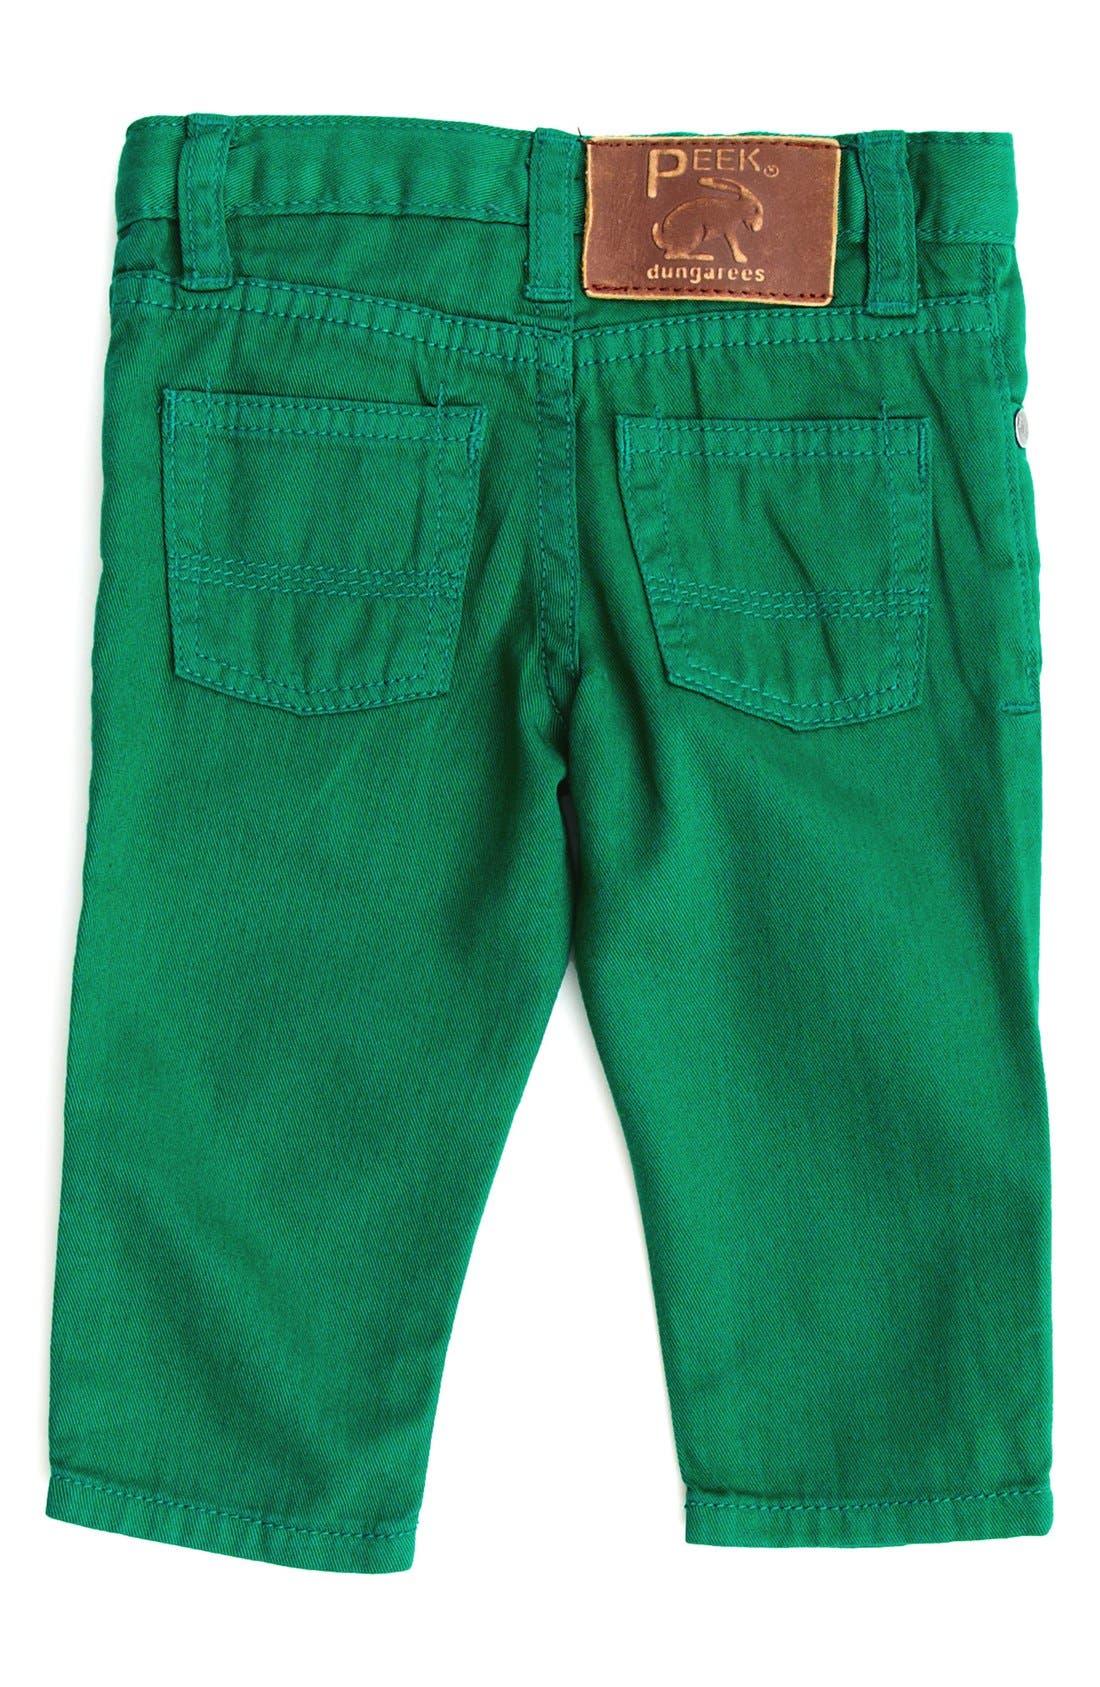 Alternate Image 2  - Peek Slouch Twill Jeans (Baby Boys)